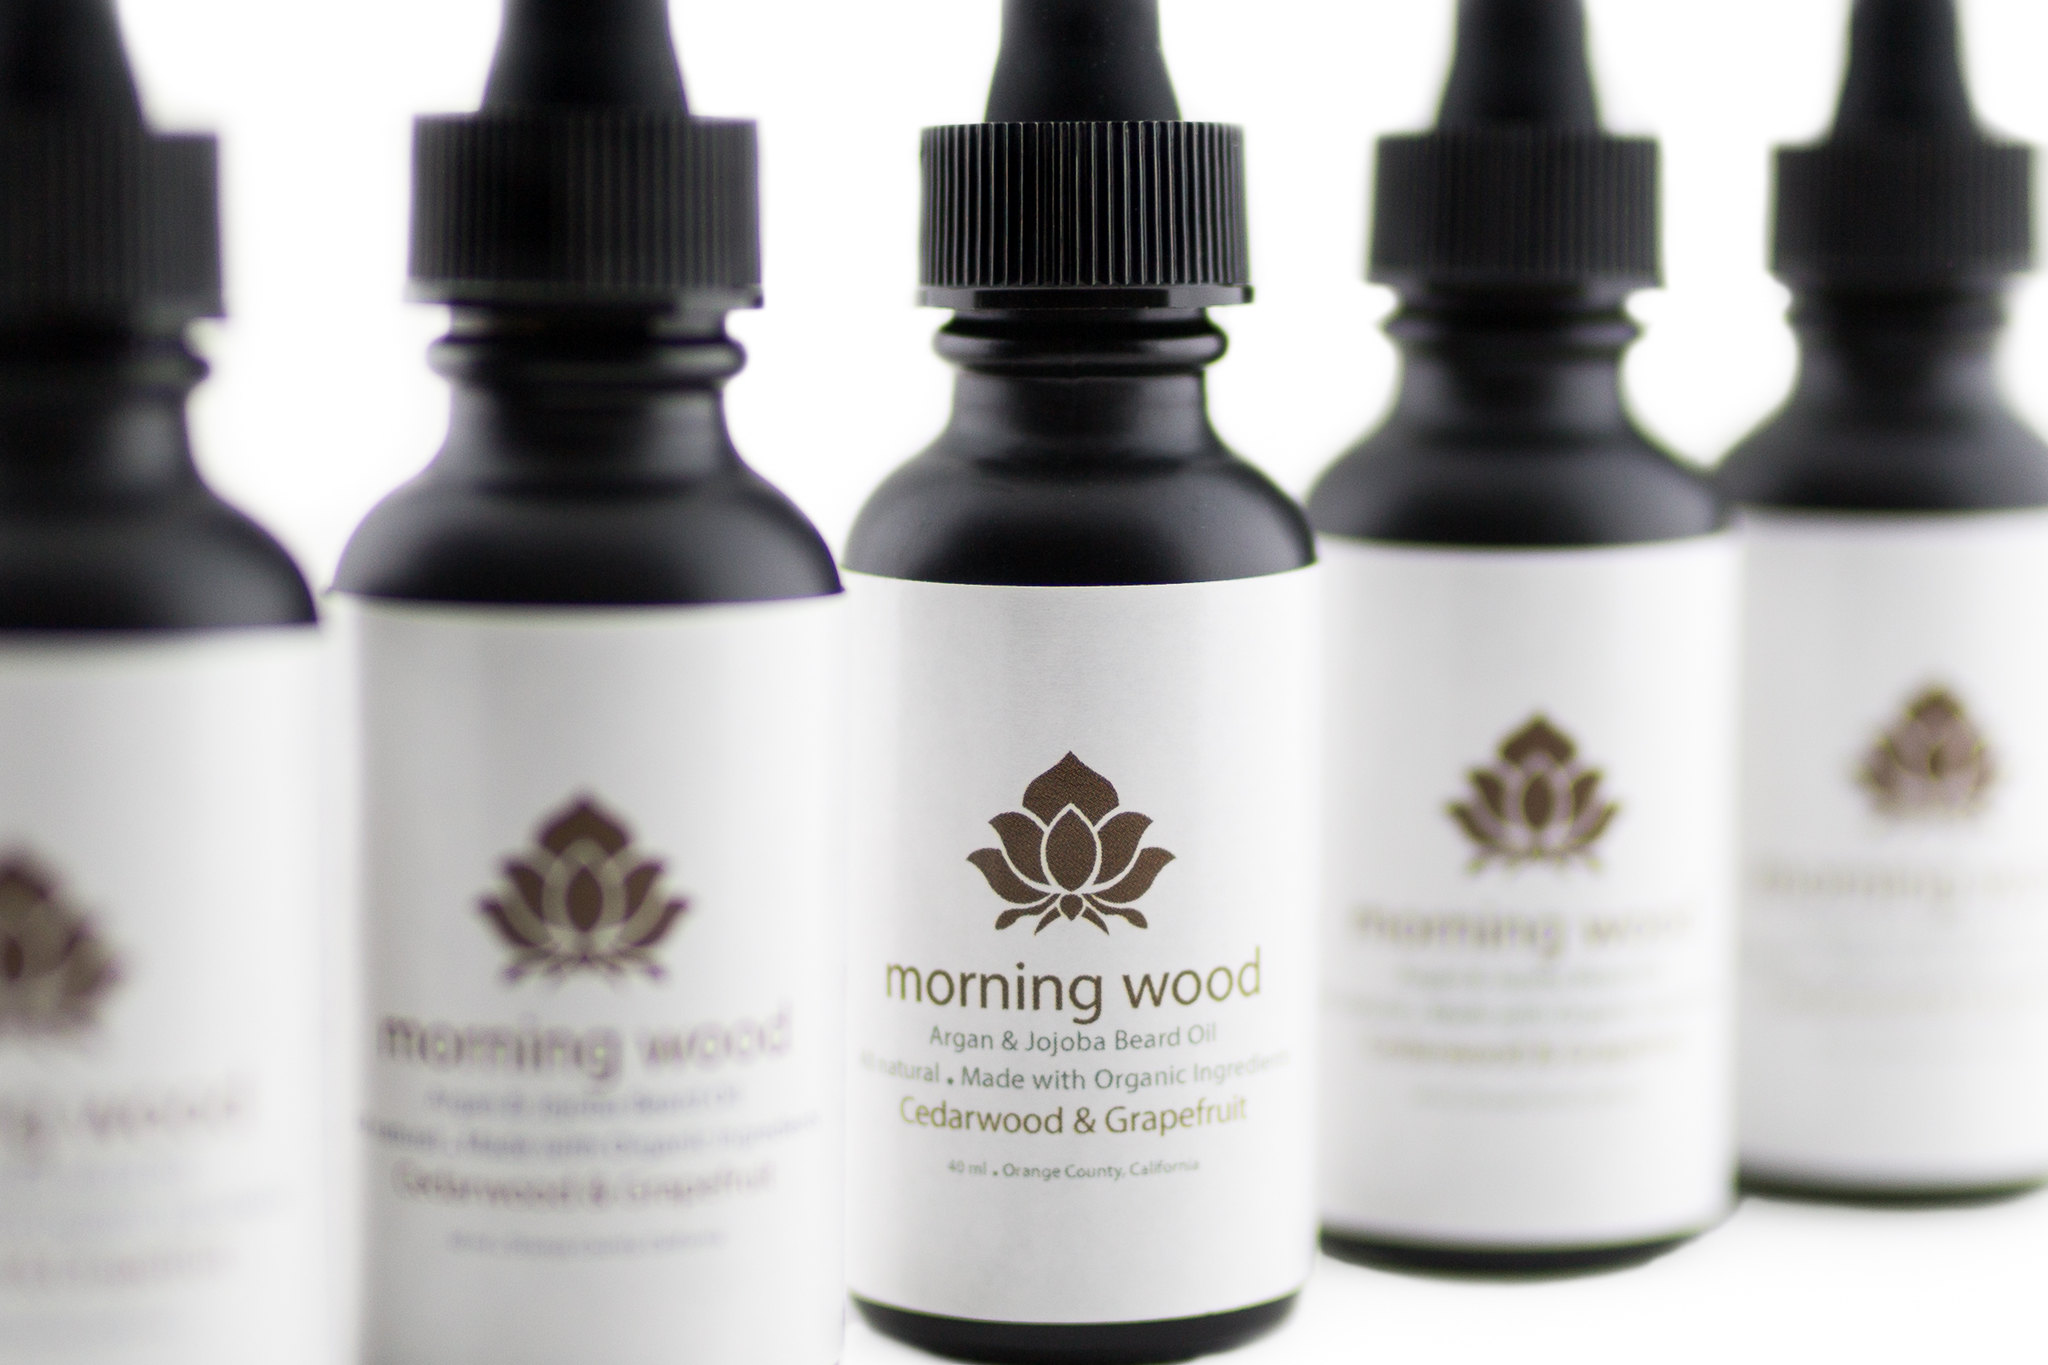 Morning Wood Organic Beard Oil